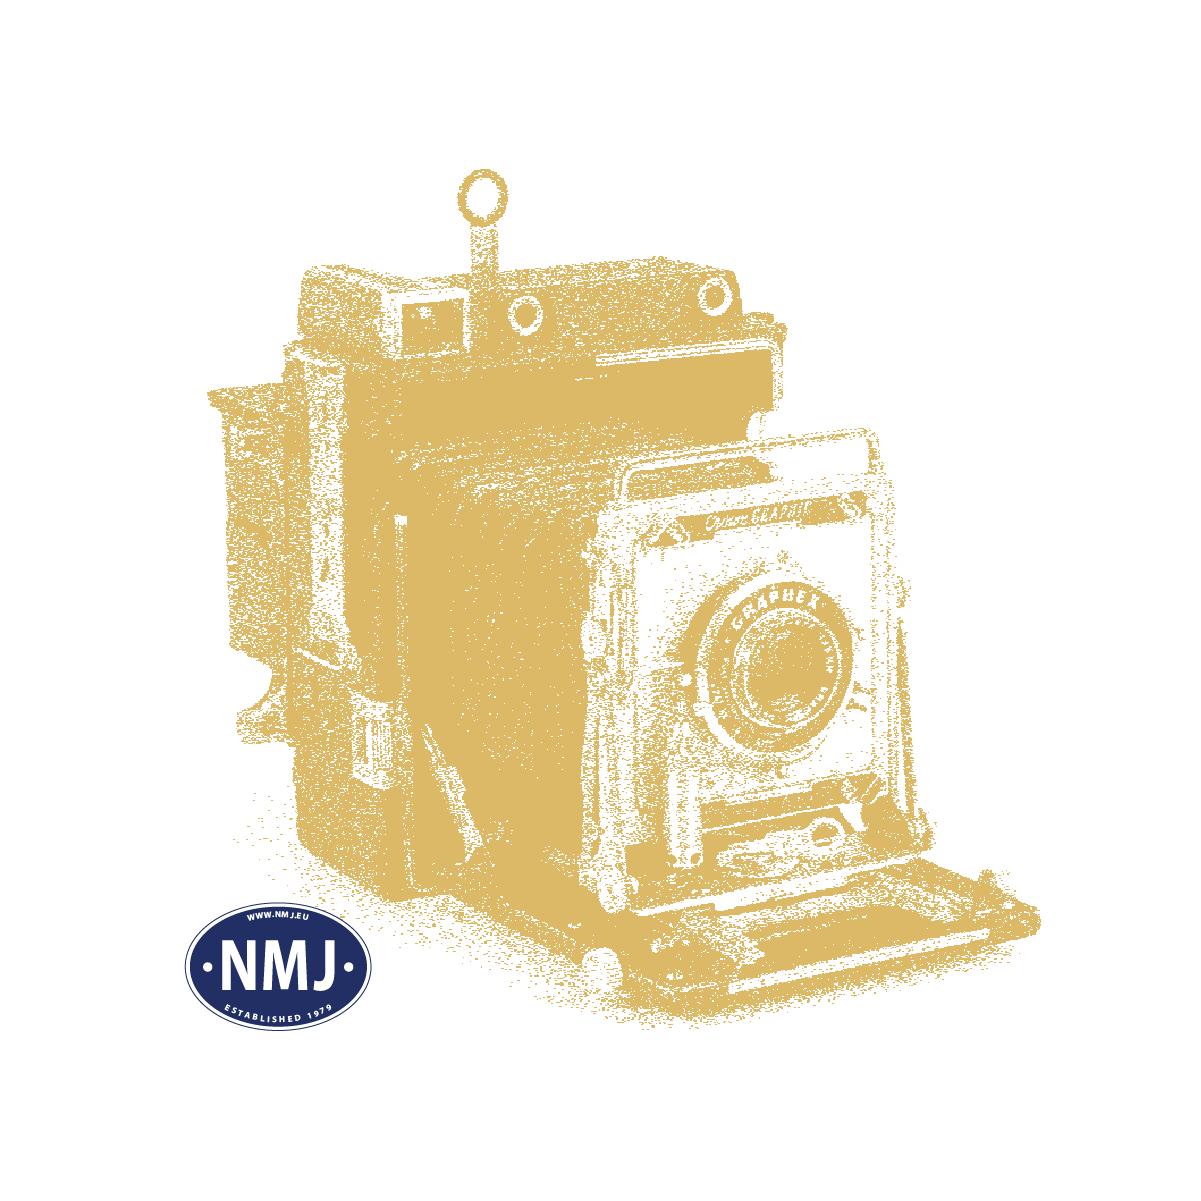 NMJT85.102 - NMJ Topline NSB Di8.710, DC